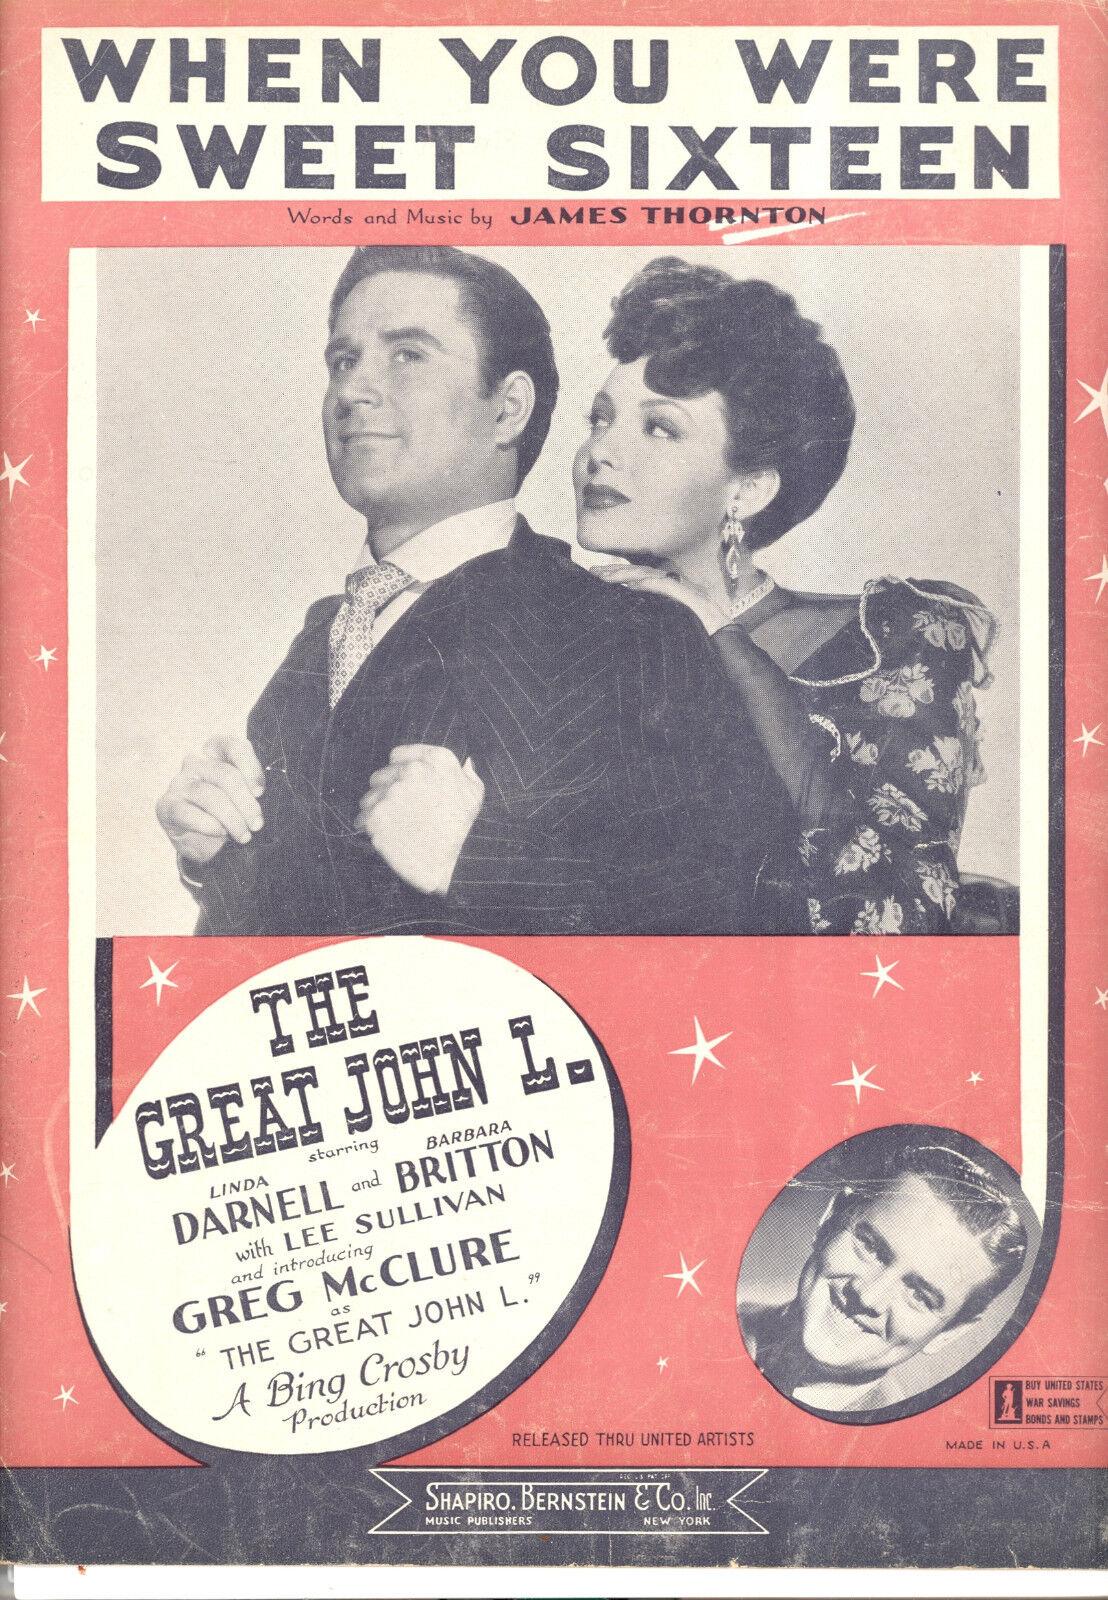 THE GREAT JOHN L. Sheet Music  When You Were Sweet Sixteen  Linda Darnell